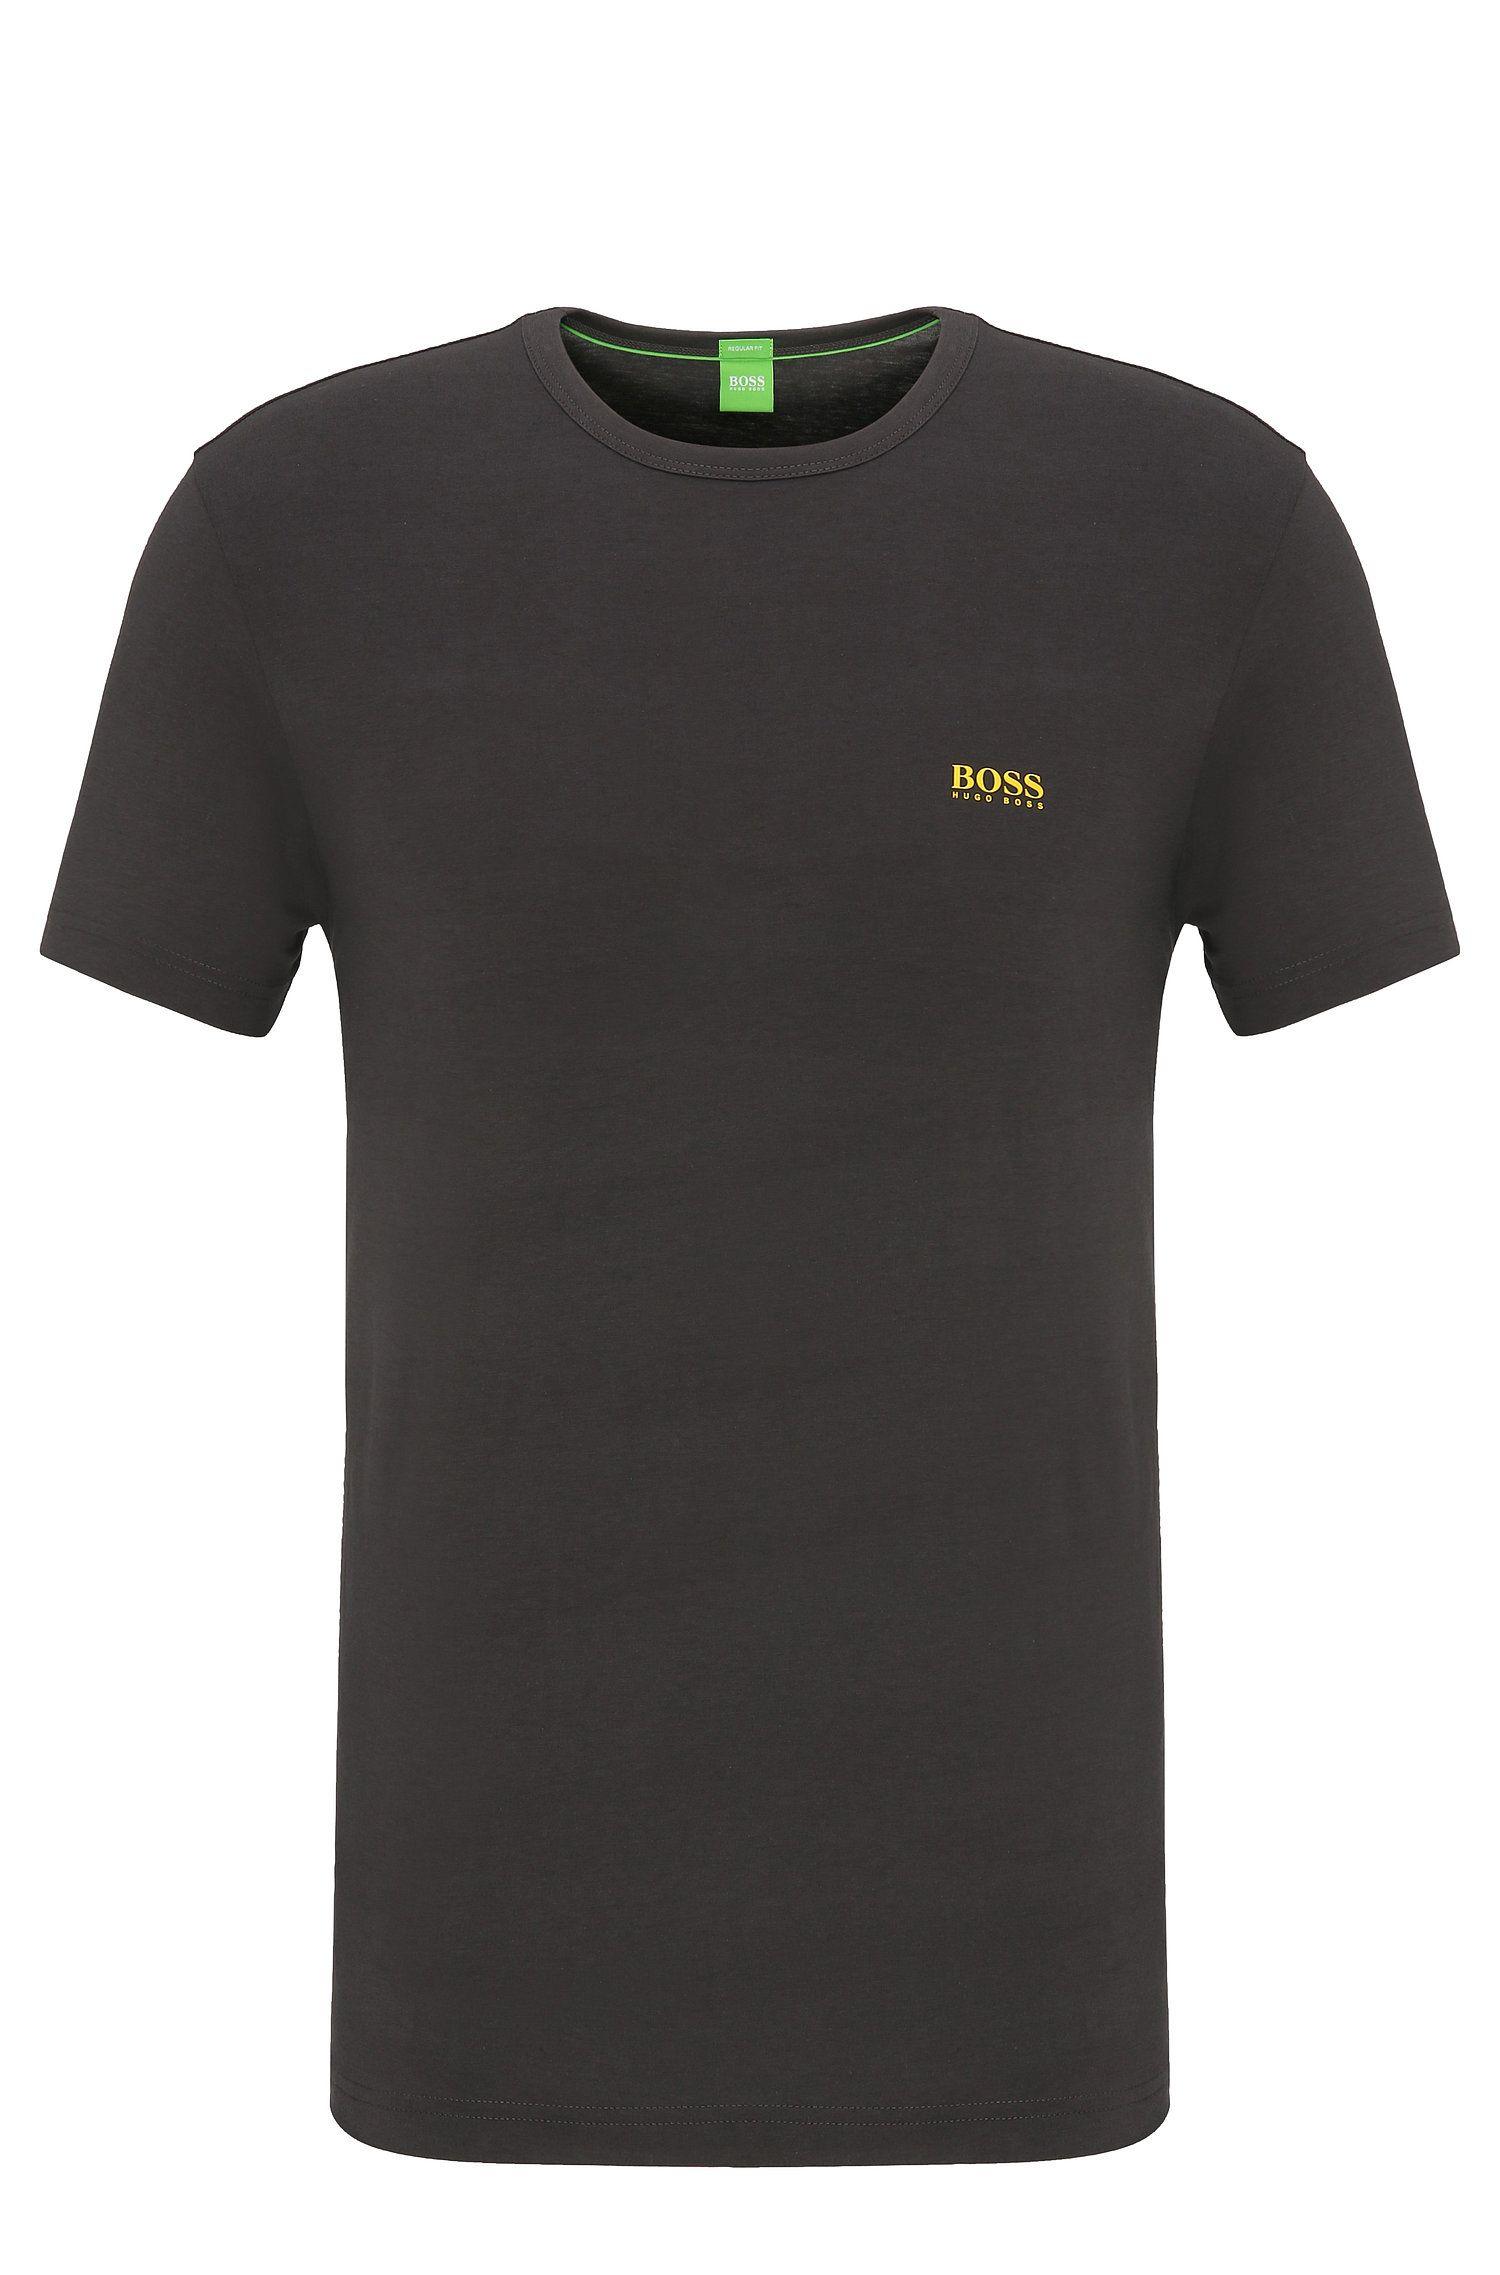 Cotton Graphic T-Shirt   Tee